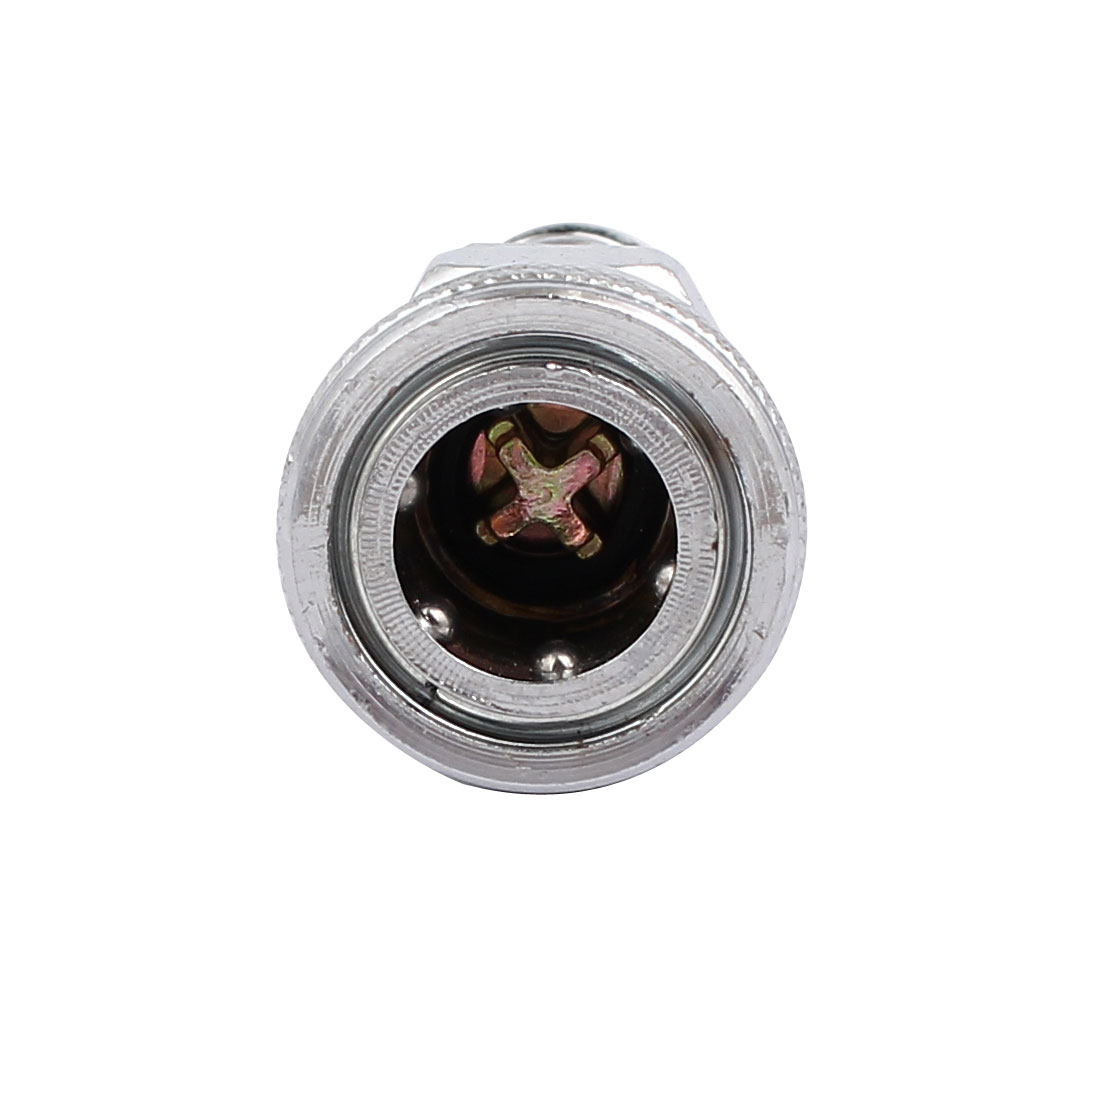 SH40 12mm Galvanized Air Hose Line Quick Coupler Connector for Compressor 10pcs - image 1 de 4